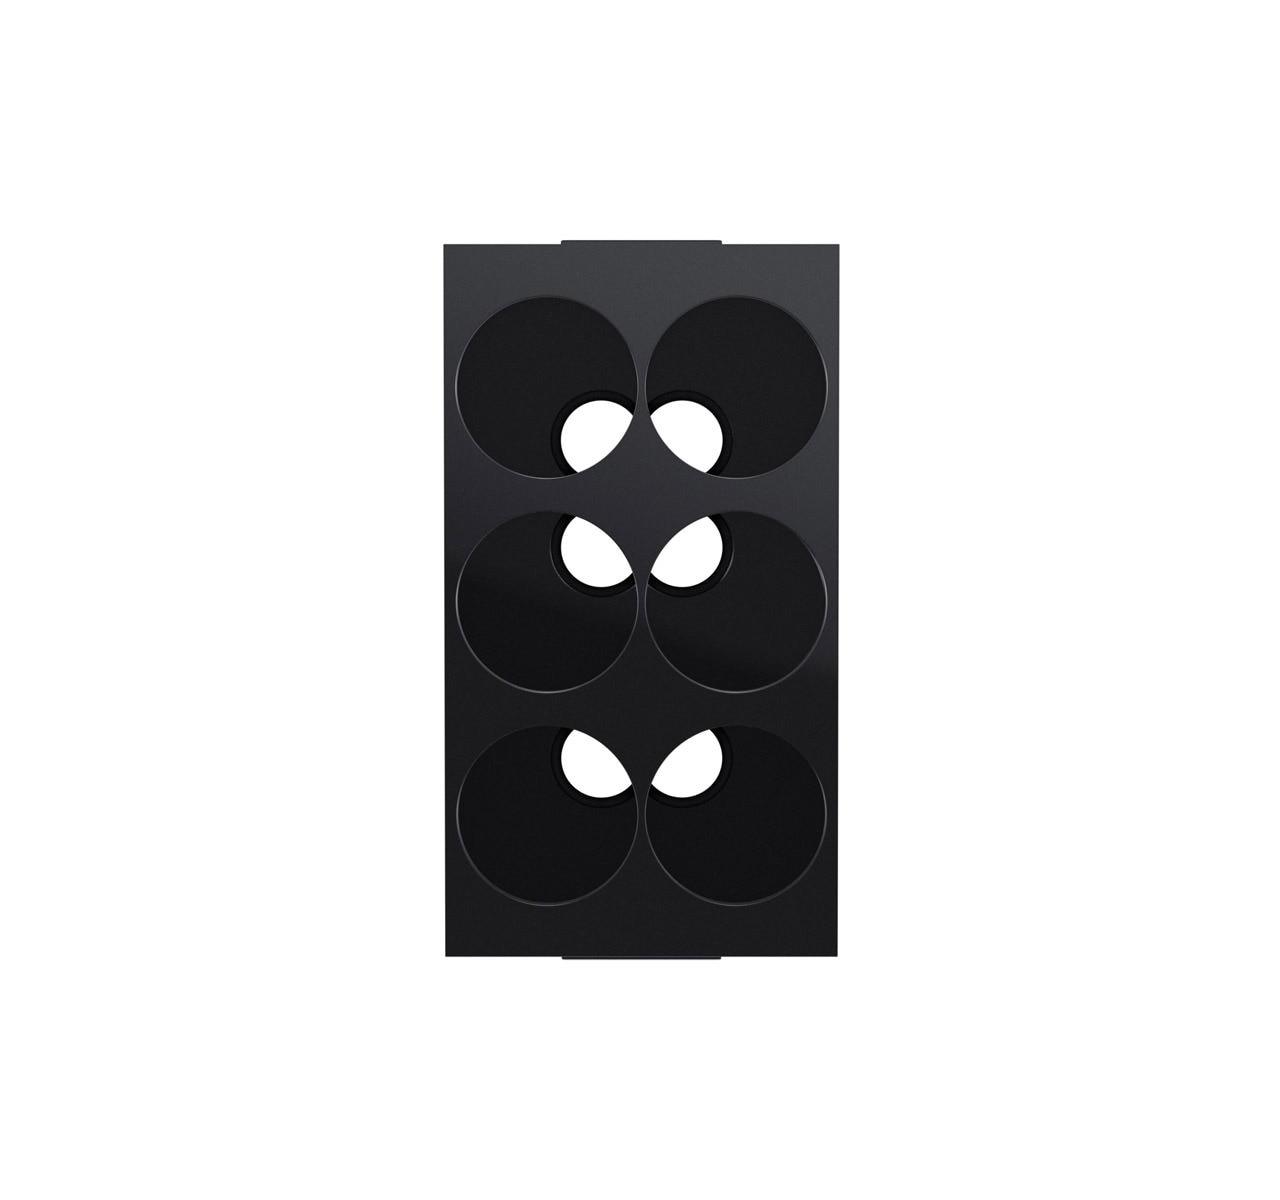 Pro Palette Eye Shadow / Concealer X 6 (Insert) by Mac Cosmetics